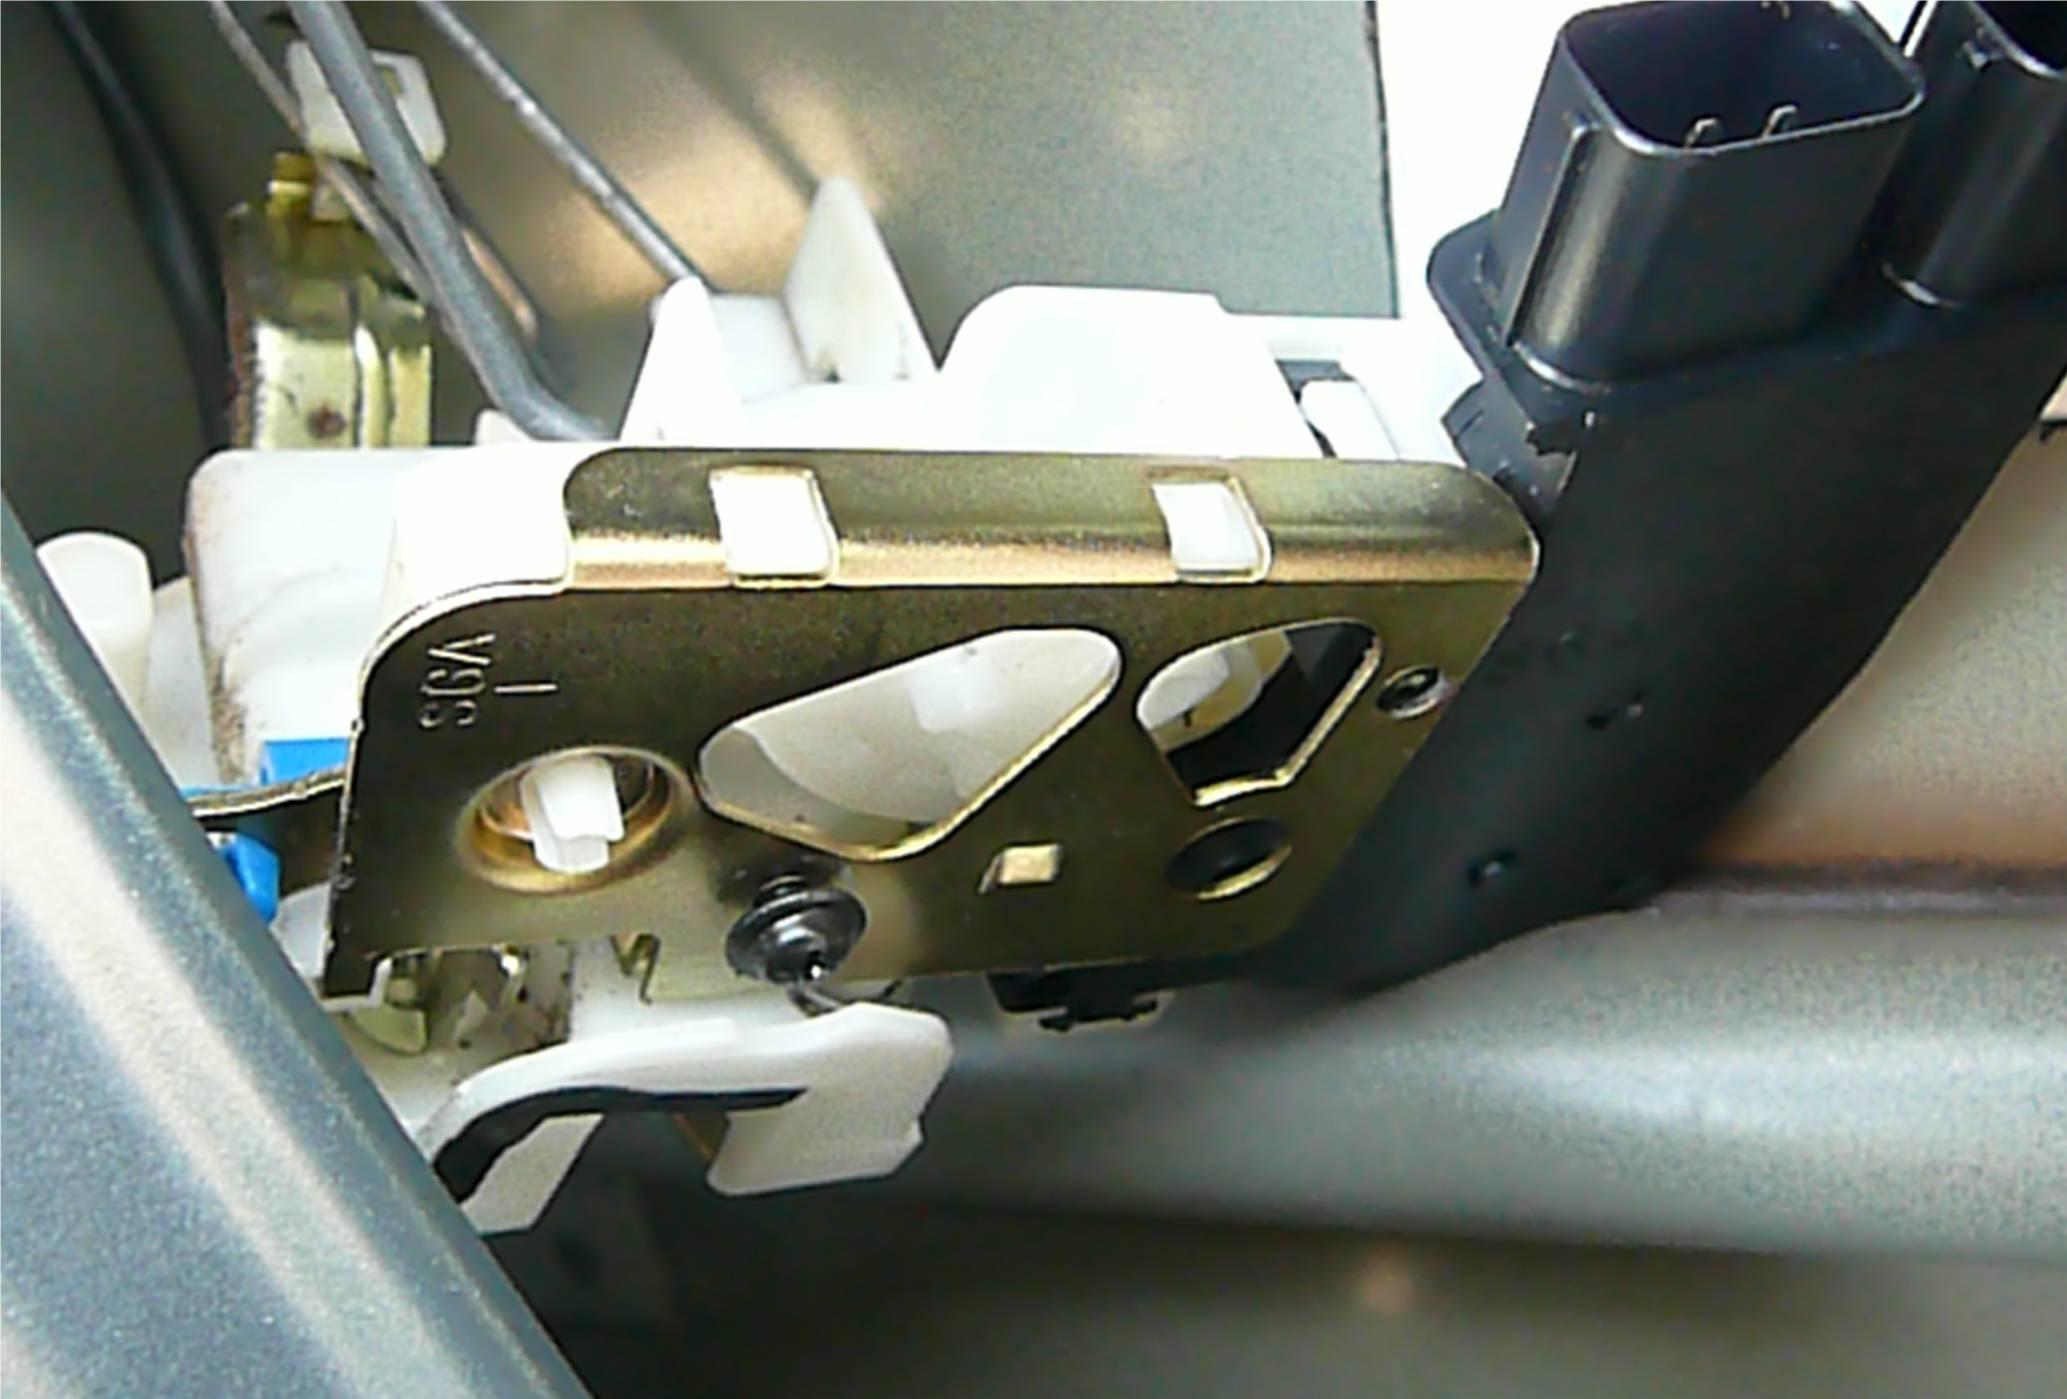 03 Locks Not Working Page 4 Honda Pilot Honda Pilot Forums